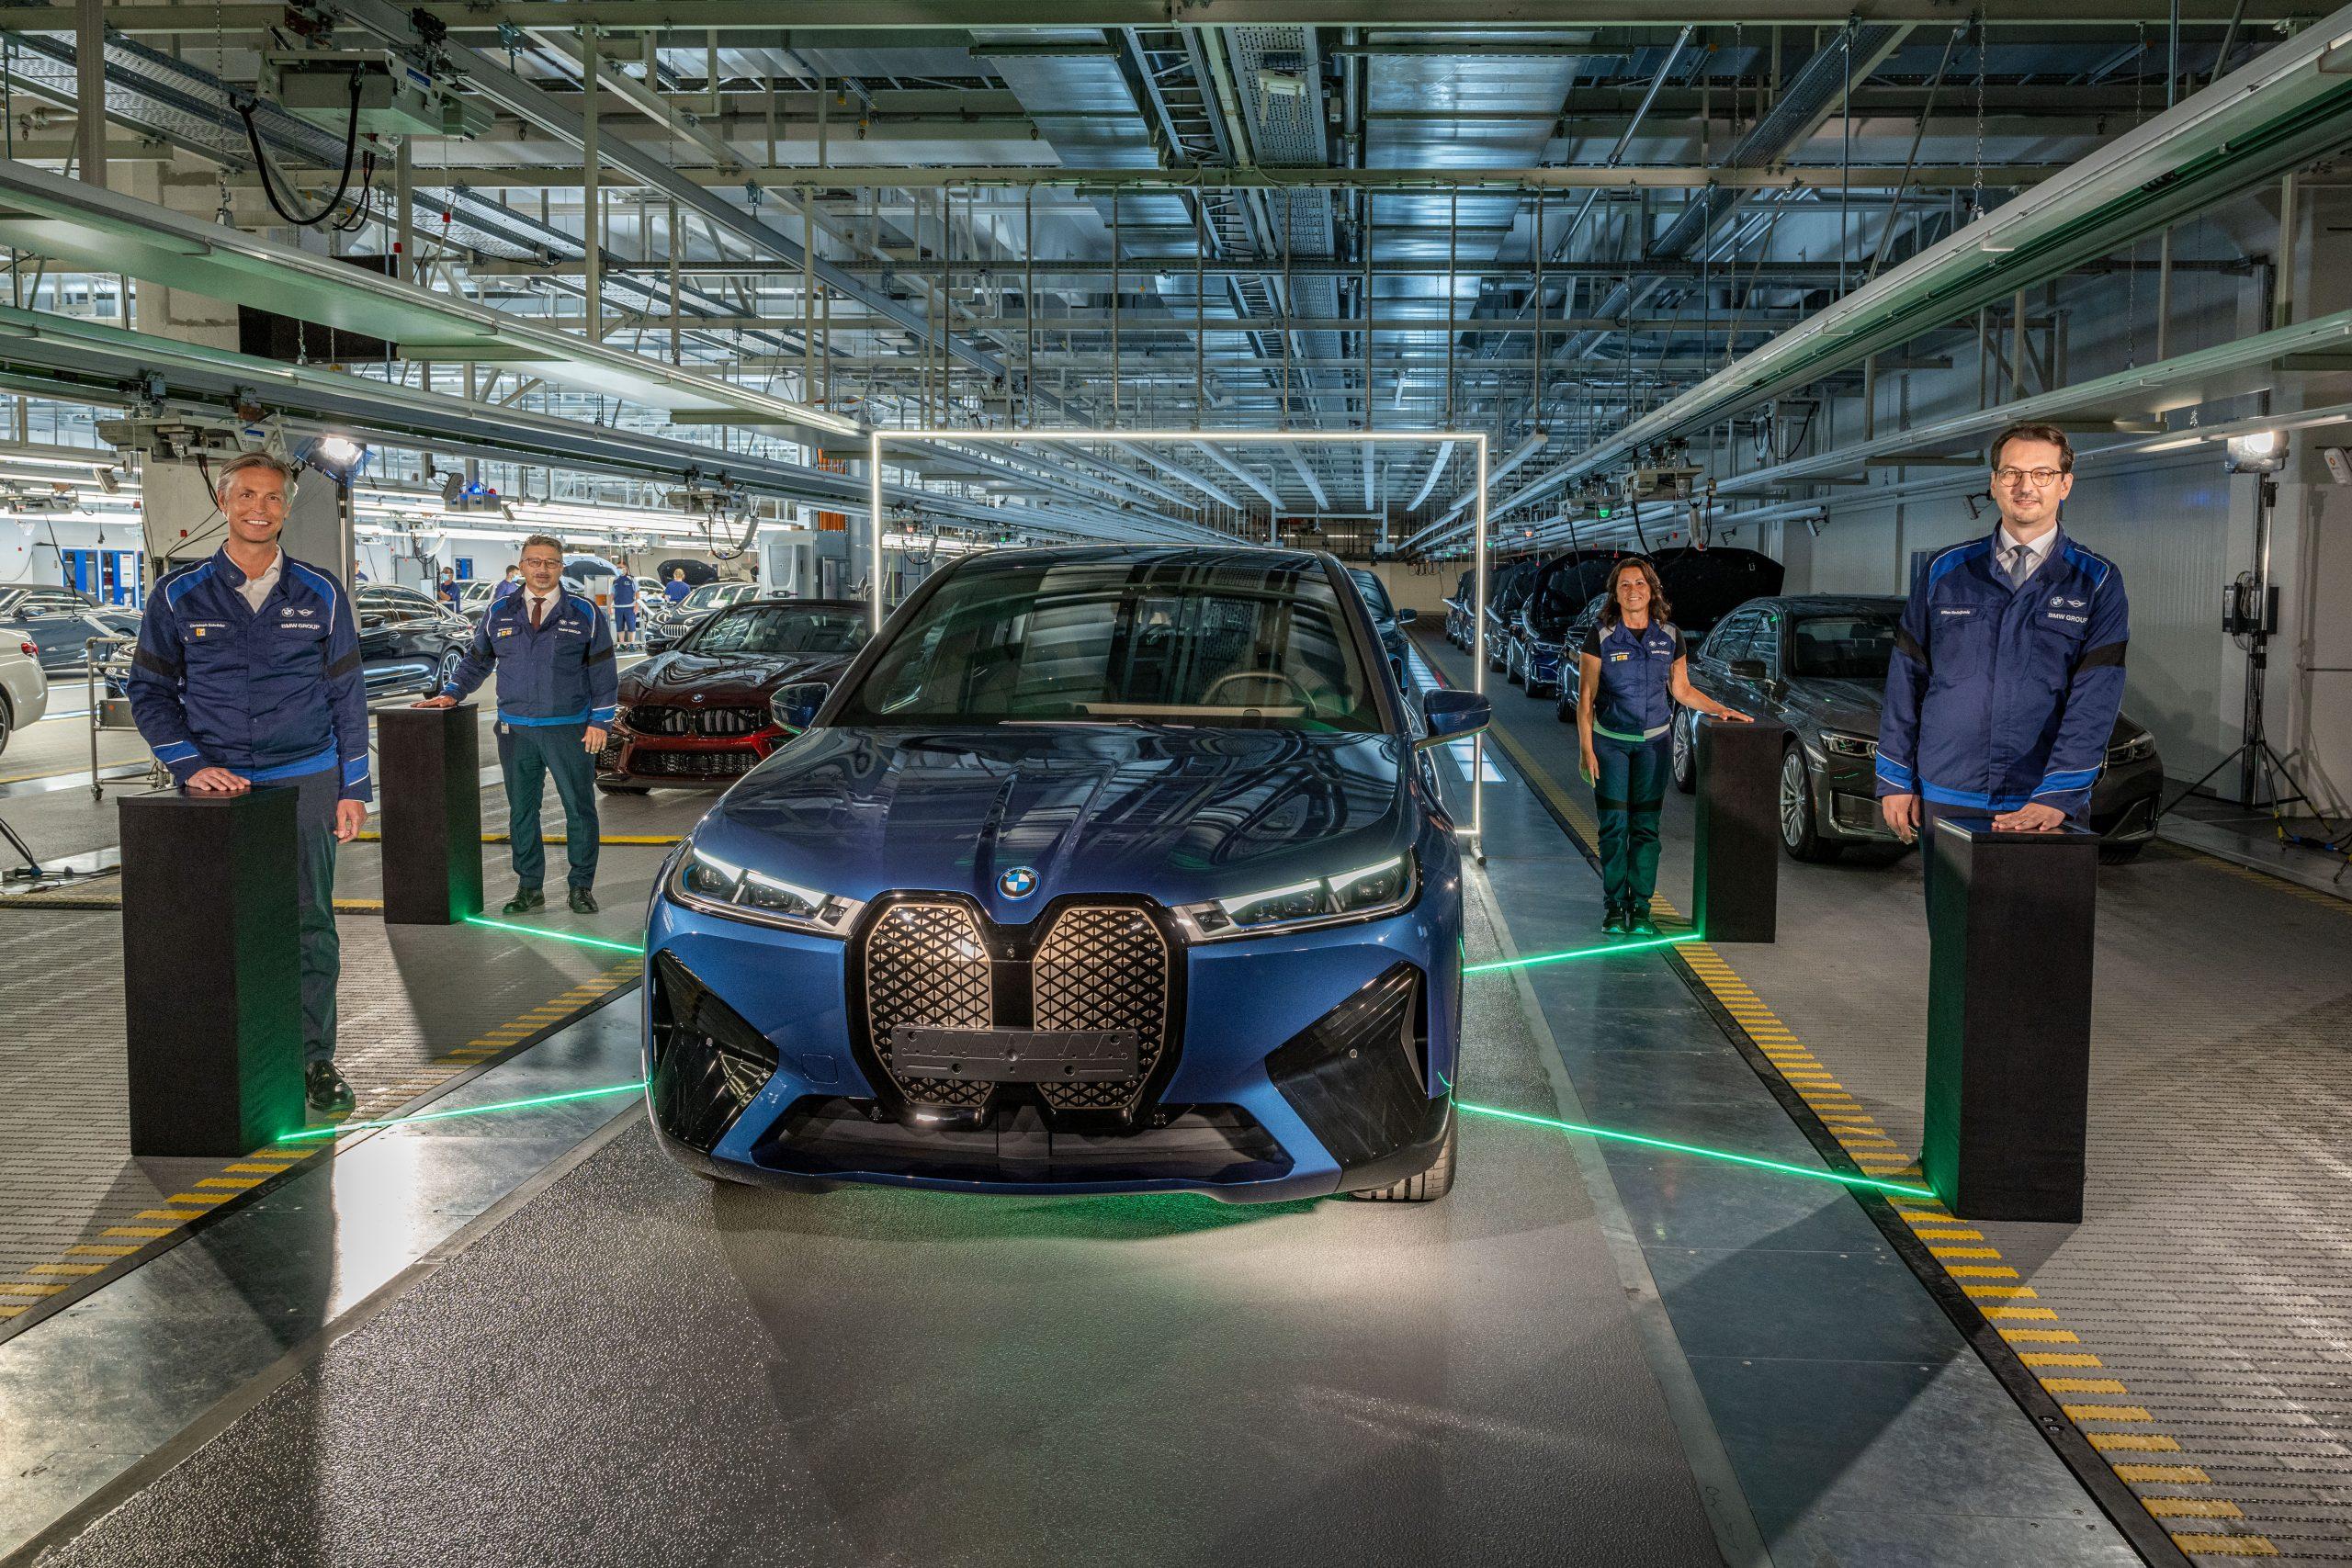 P90428678 highRes scaled Οι πρώτες BMW iX βγαίνουν από τη γραμμή παραγωγής BMW, BMW i, BMW iX, Electric cars, electric vehicles, ειδήσεις, ηλεκτρικά, ηλεκτροκινηση, Νέα